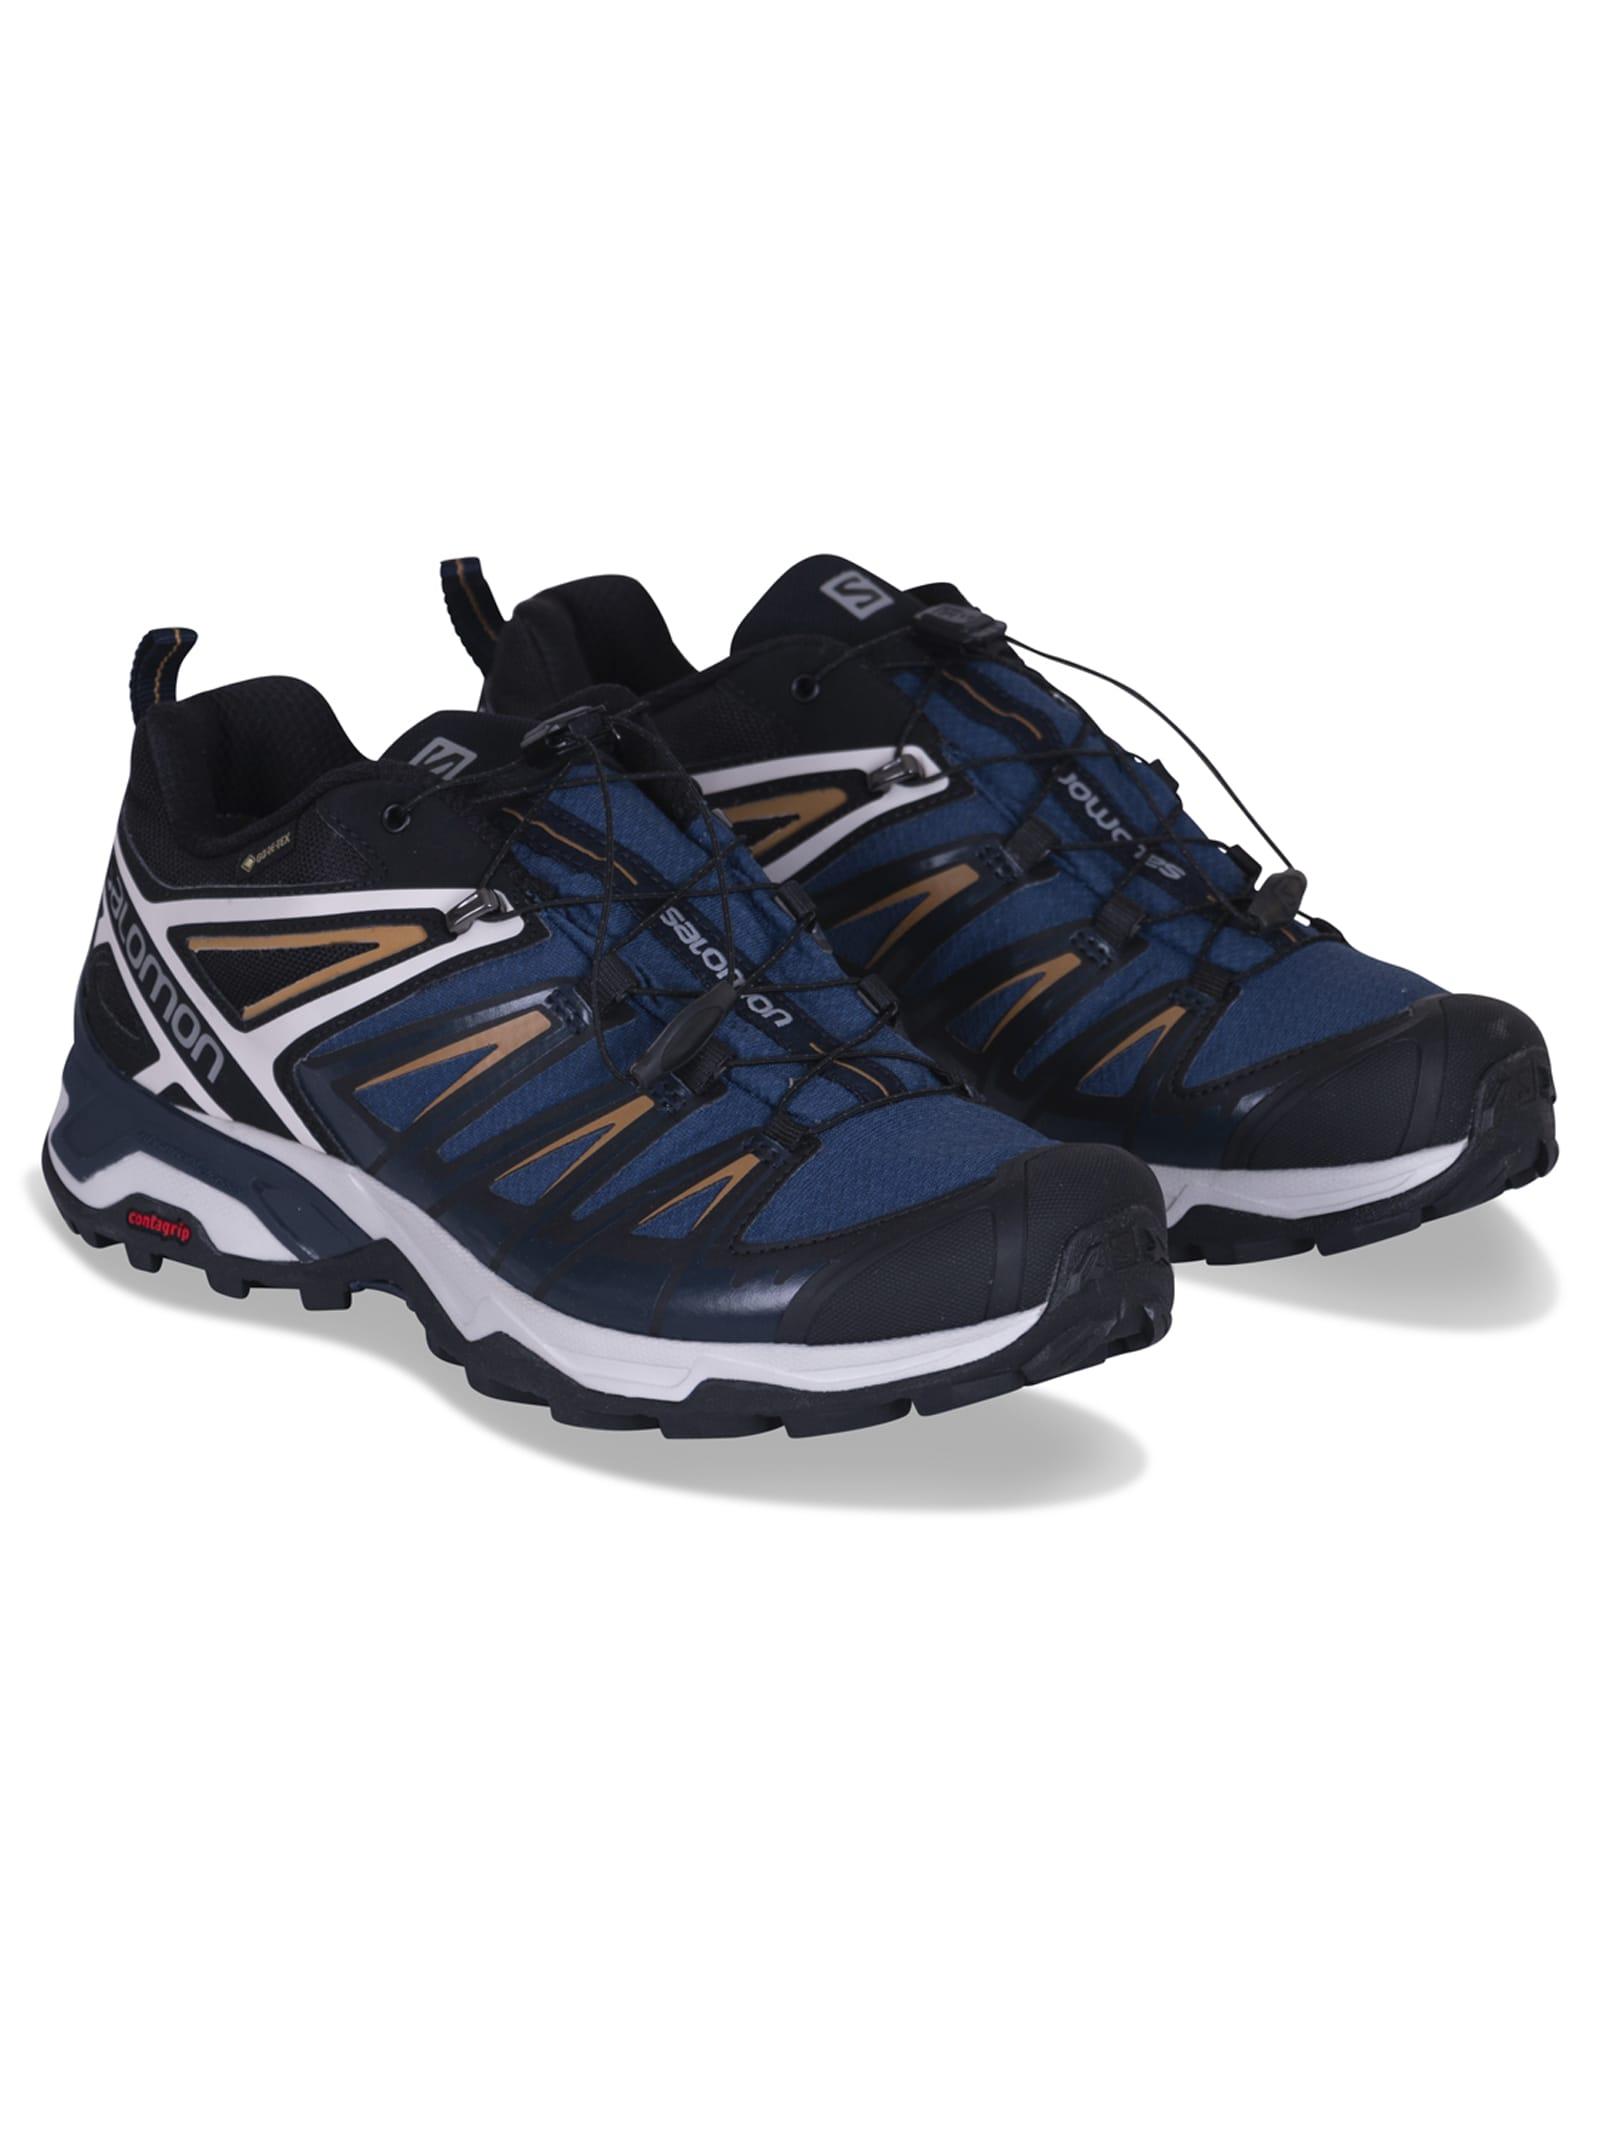 sports shoes ab6de 35a7c Best price on the market at italist | Salomon X Ultra 3 Gtx - Sargasso  Sea/dark Sapphire/bistre